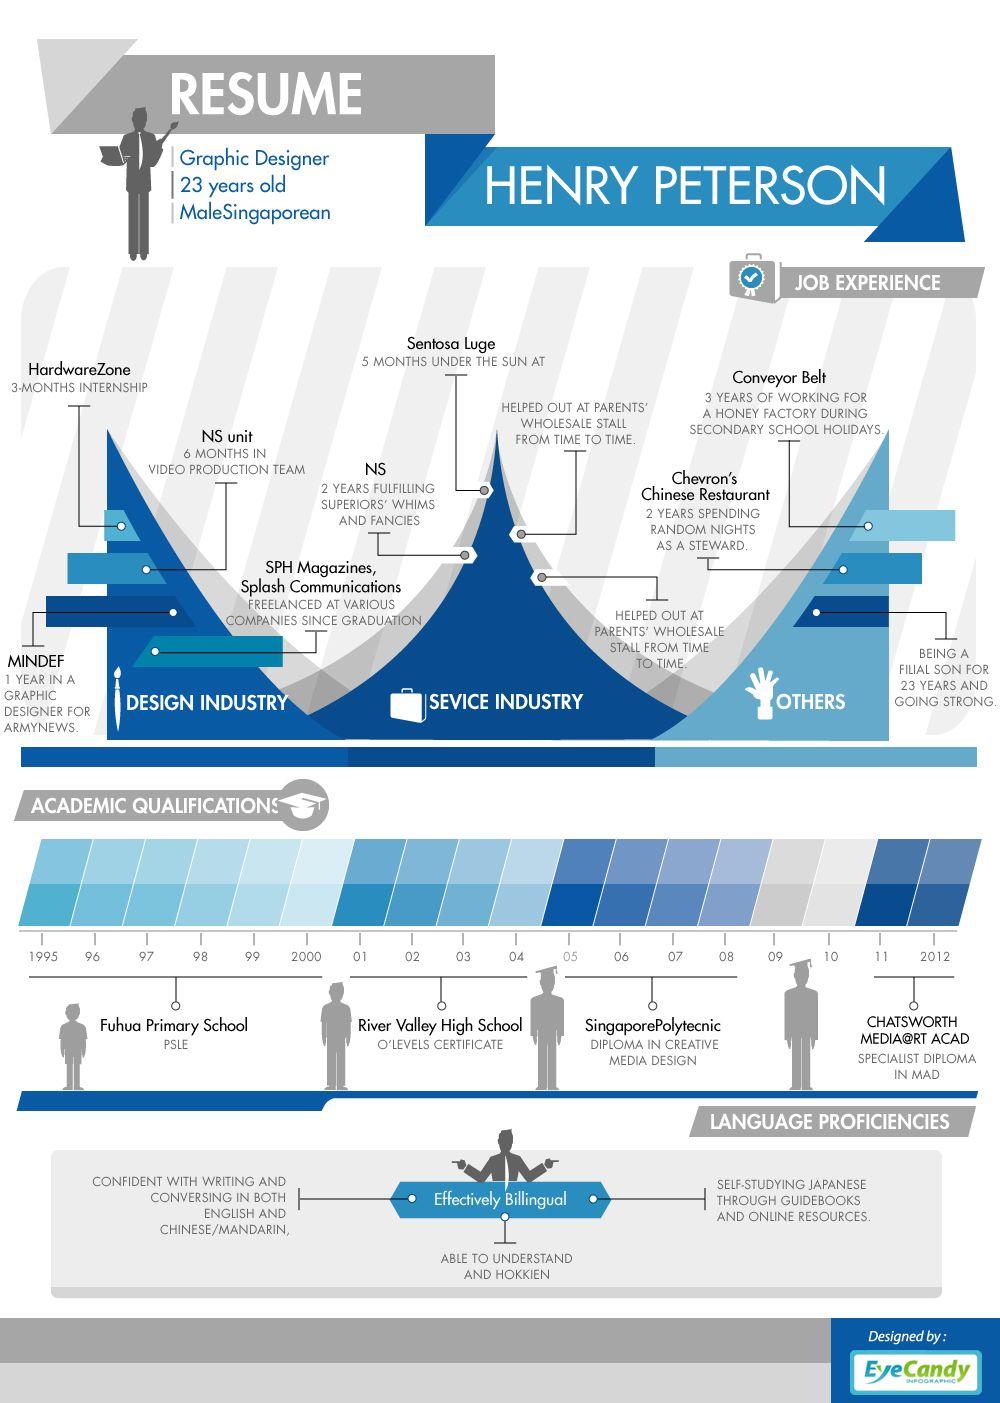 Resume infographic infographic secondary school no